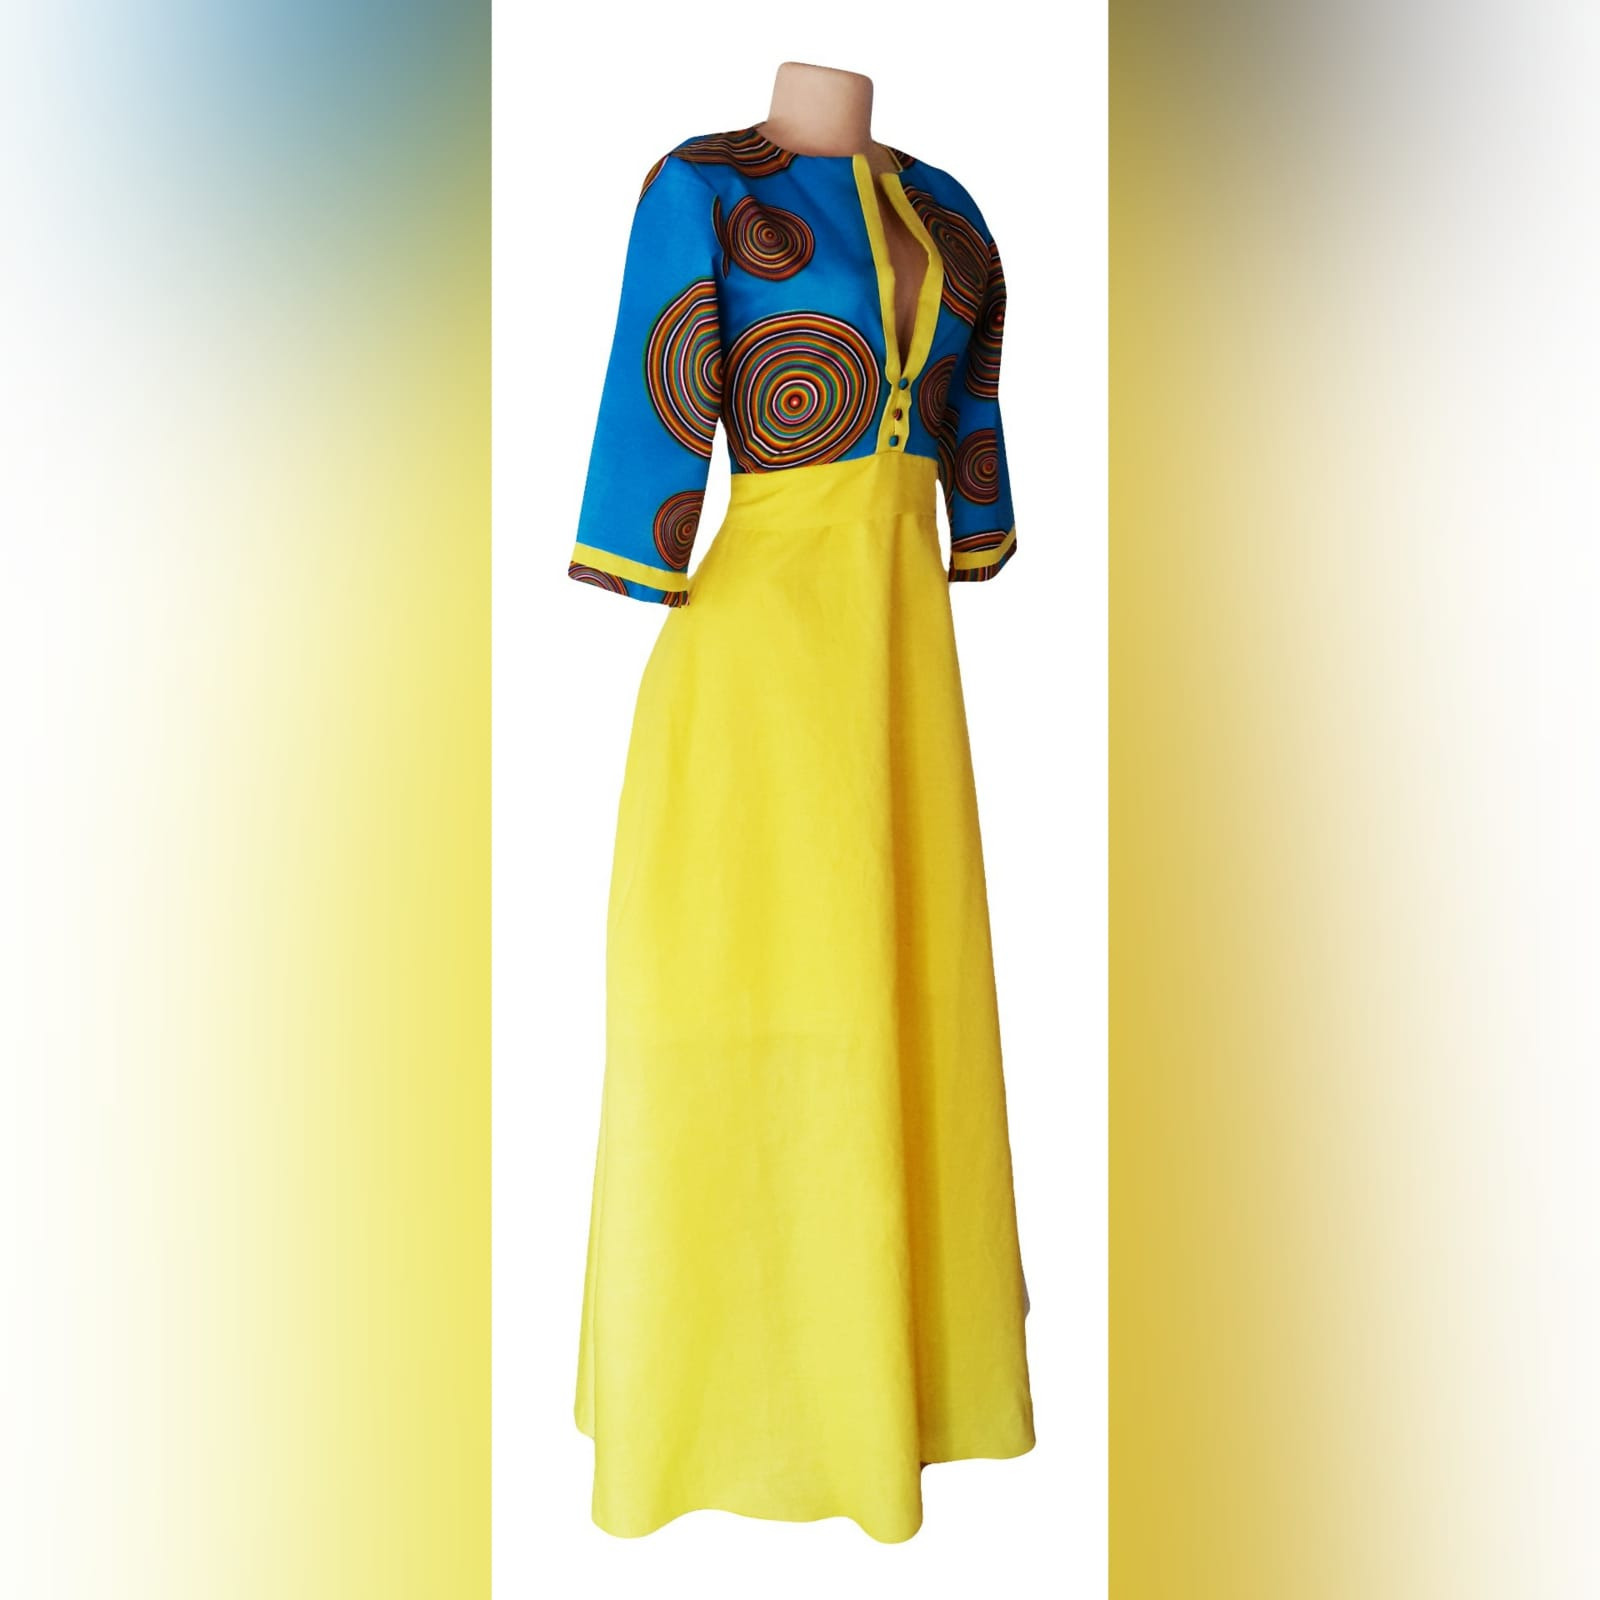 Blue & yellow modern traditional dress 9 modern traditional blue and yellow empire fit dress. Flowy bottom, neckline with a slit.